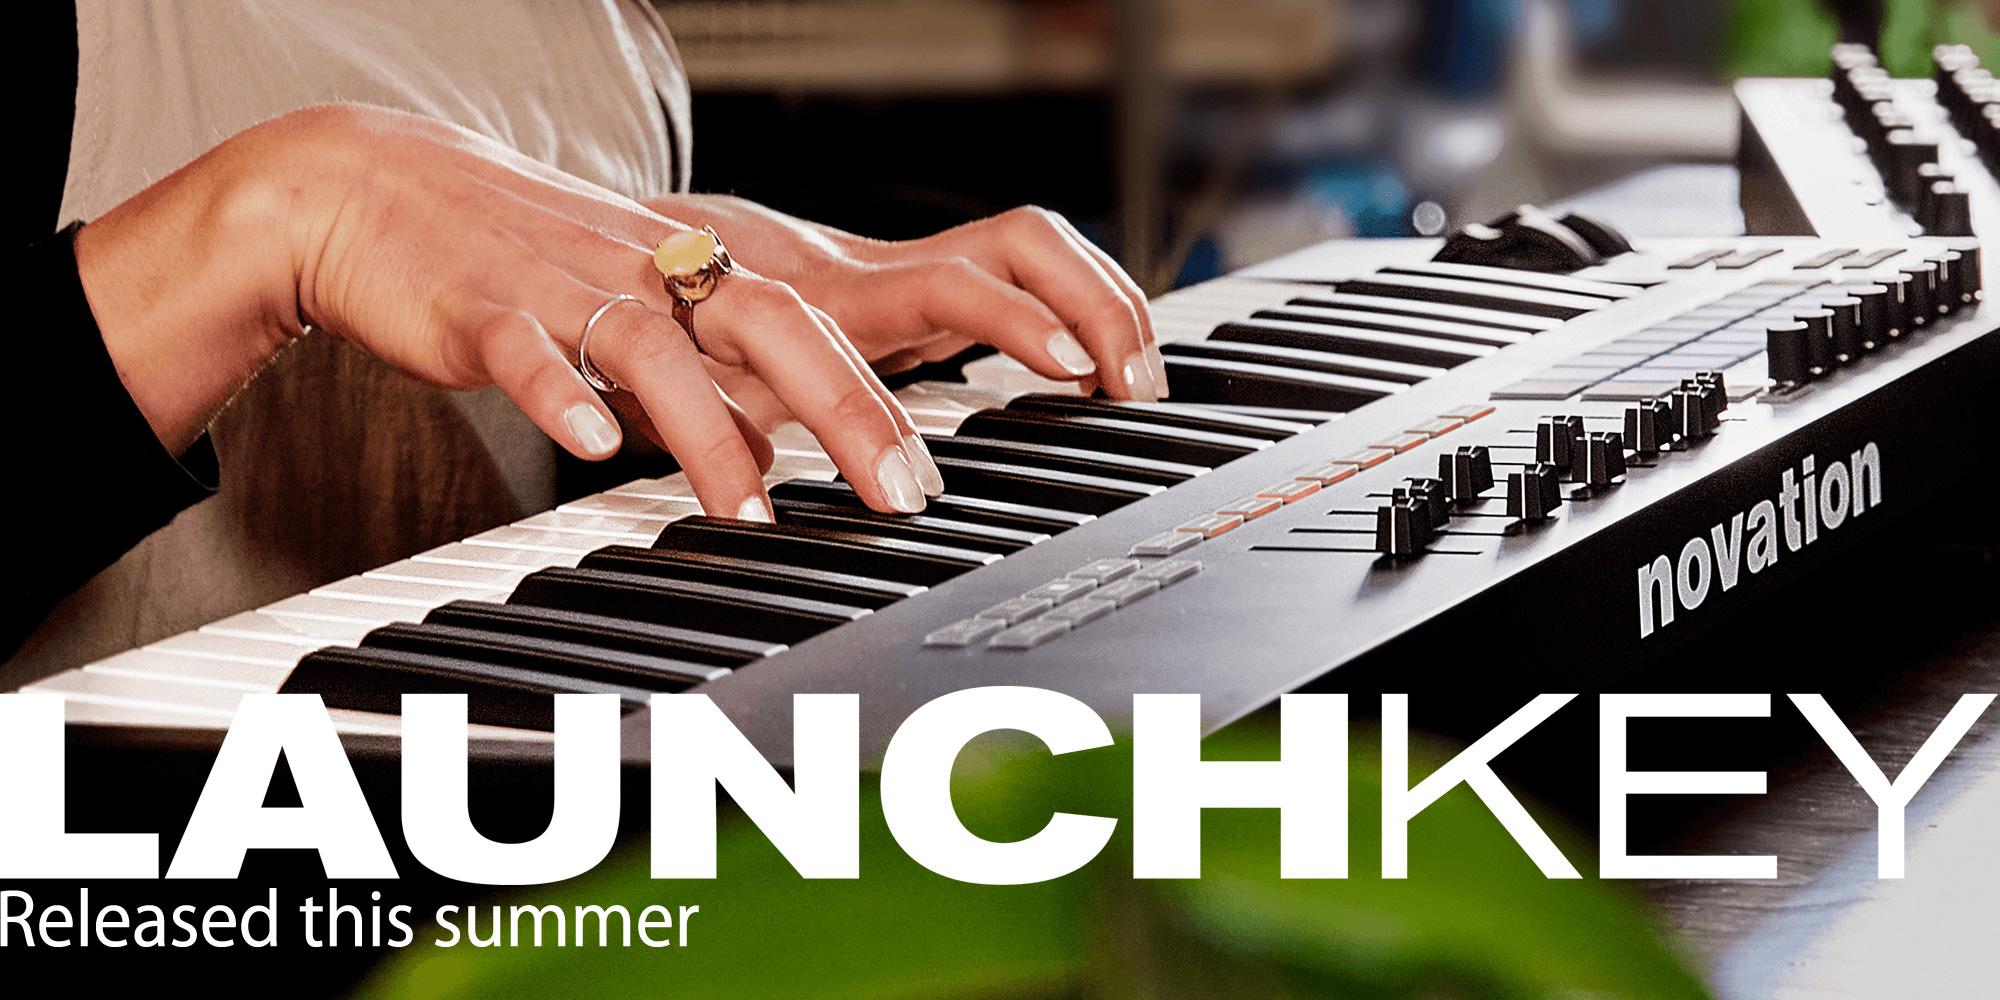 Novation MIDIキーボード新製品 LAUNCH KEY MK3を発表!